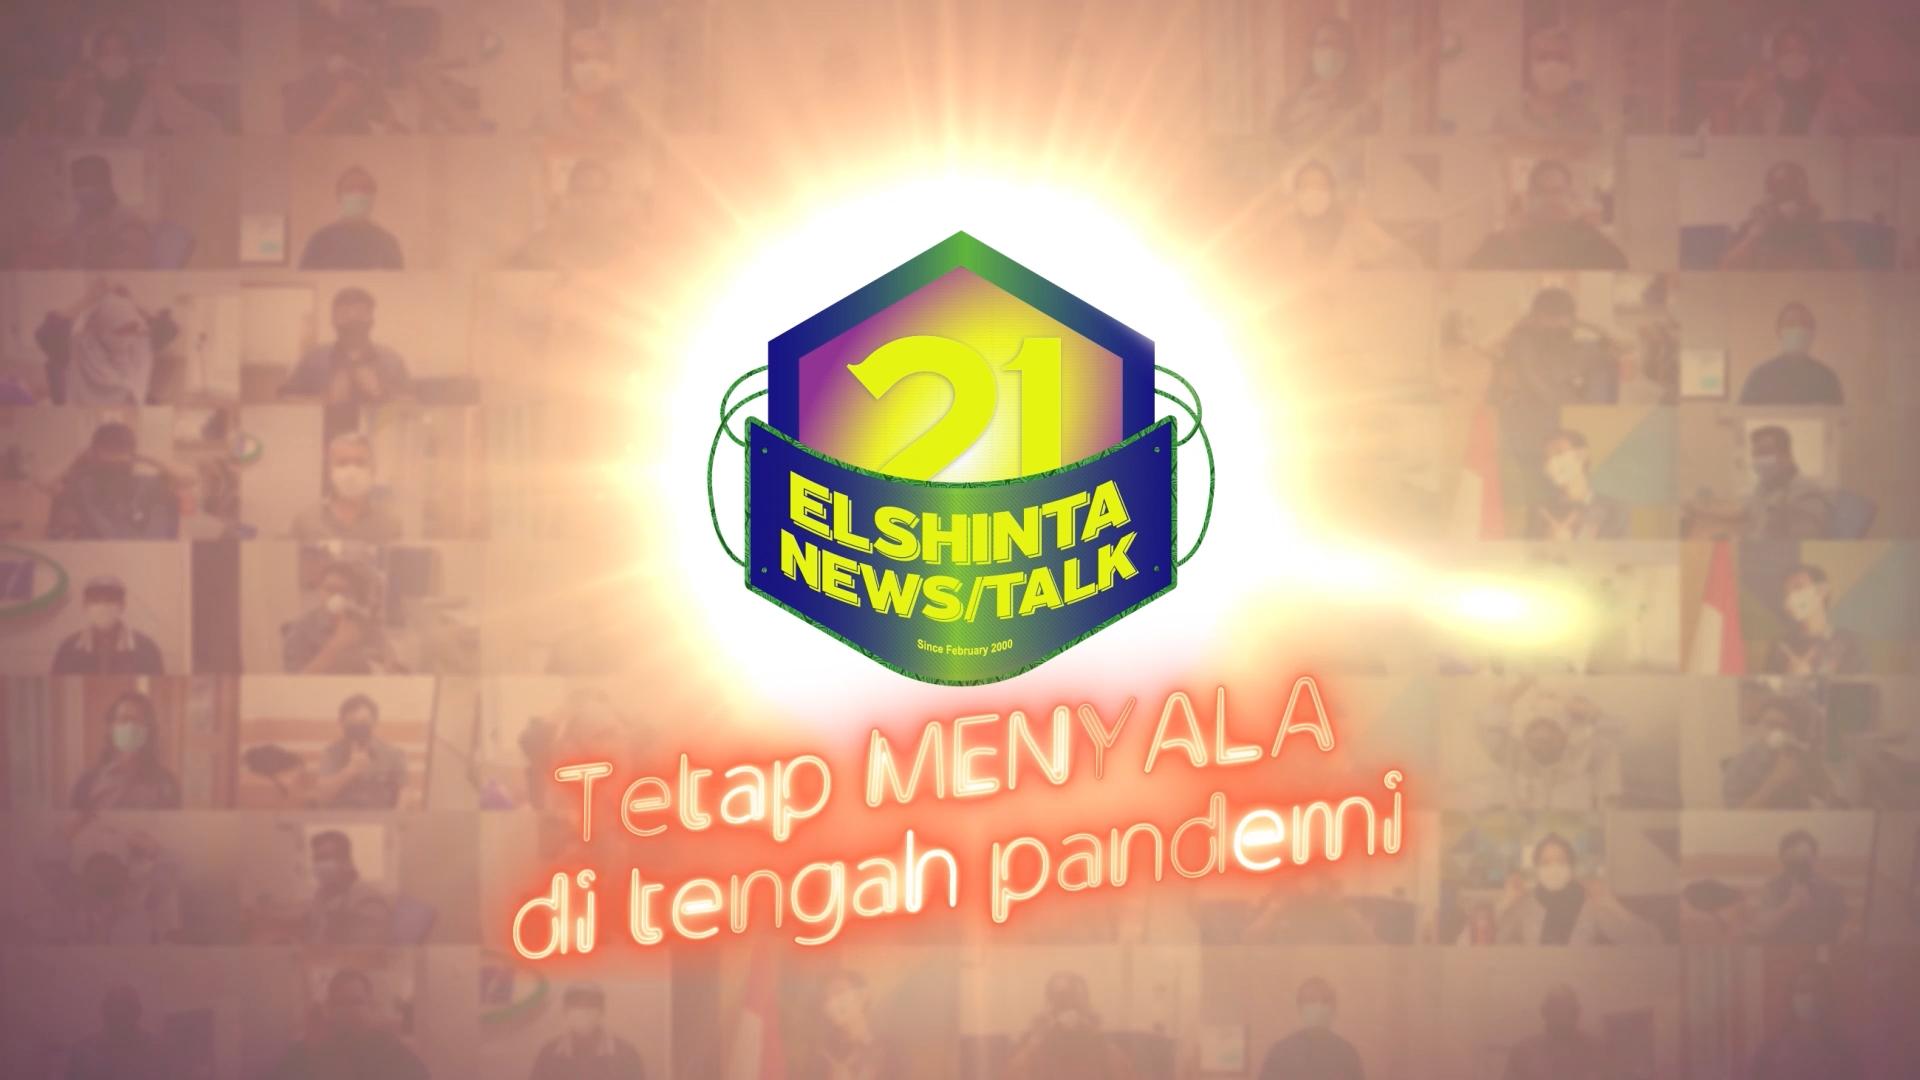 Terima kasih atas perhatian Bapak dan Ibu semua atas ucapan ulang tahun Elshinta N/T ke-21